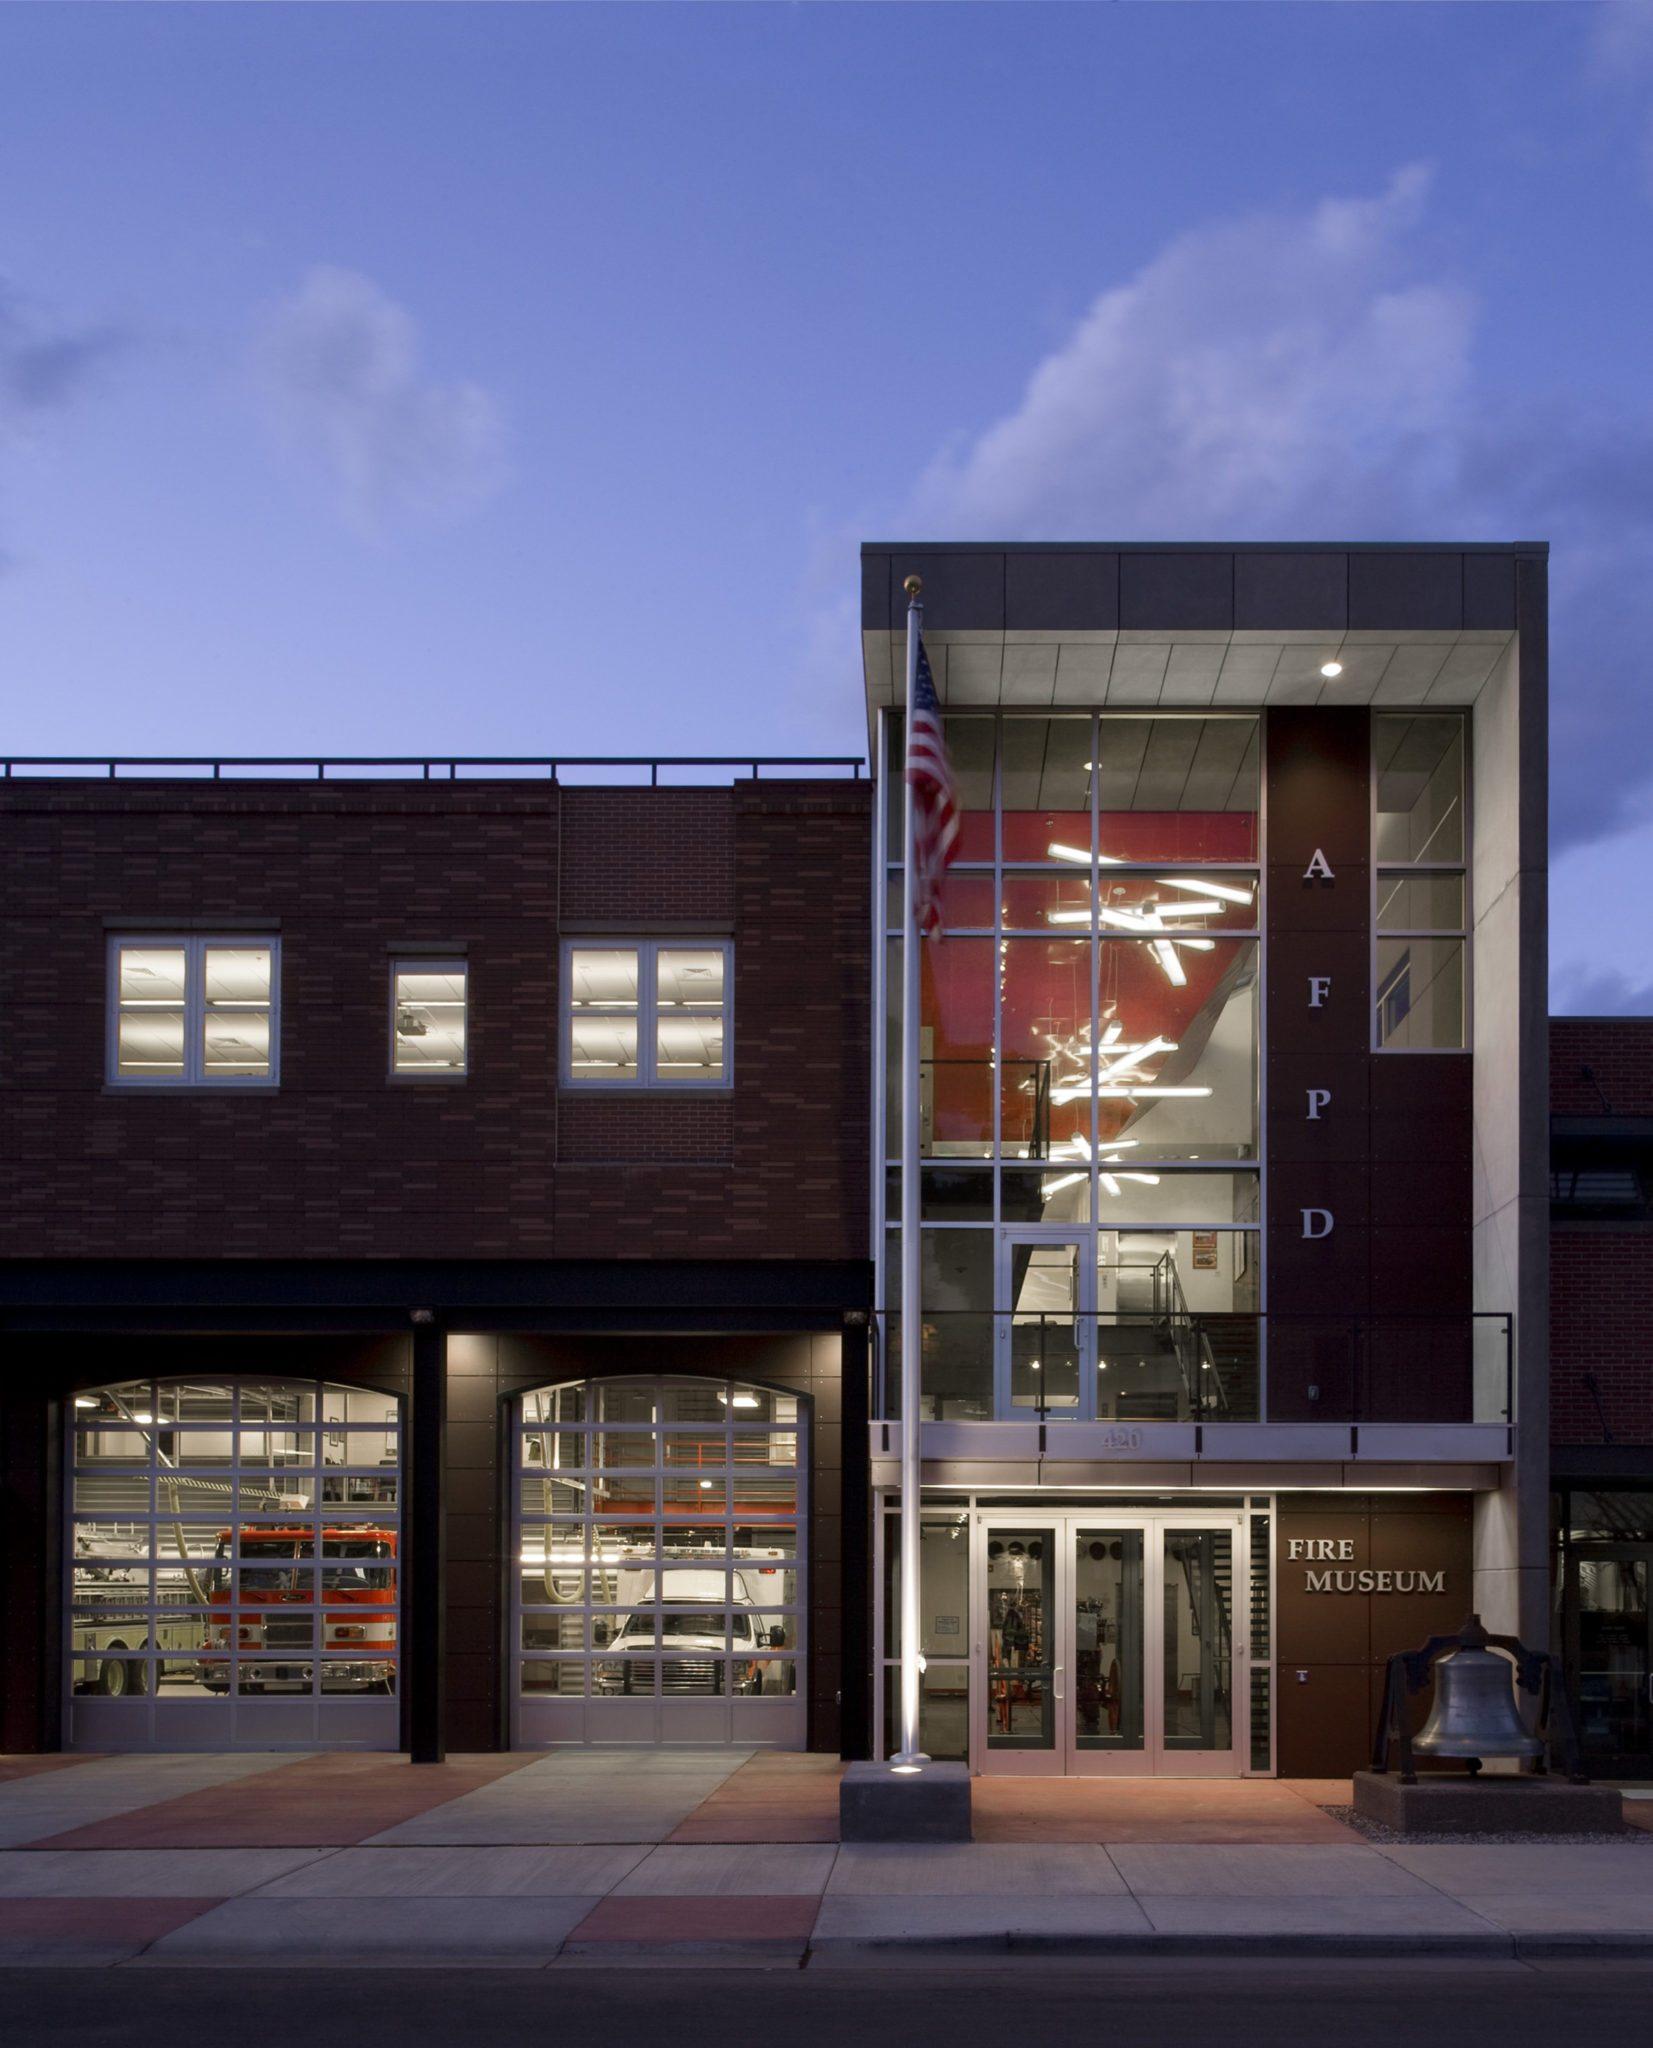 Fire station museum modern architecture and design aspen colorado